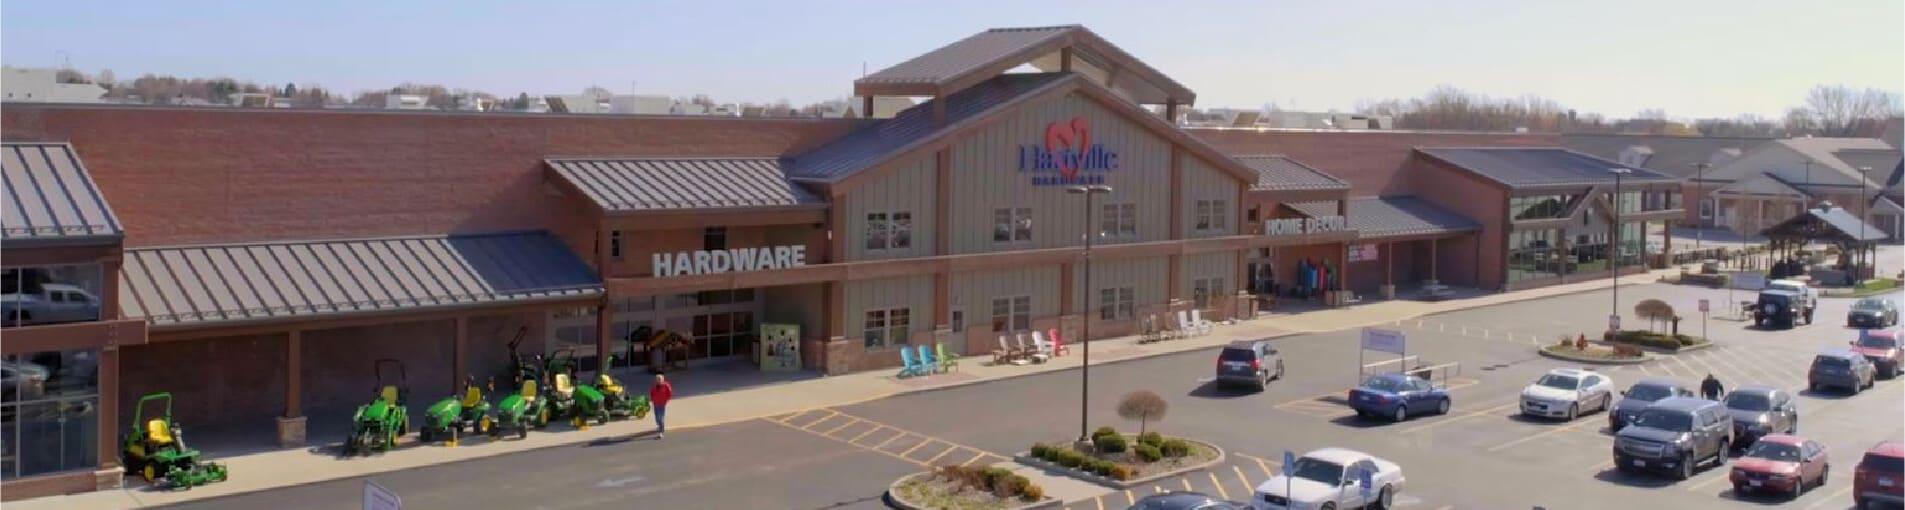 709849ce552fc5 America's largest hardware store | Hartville Hardware & Lumber